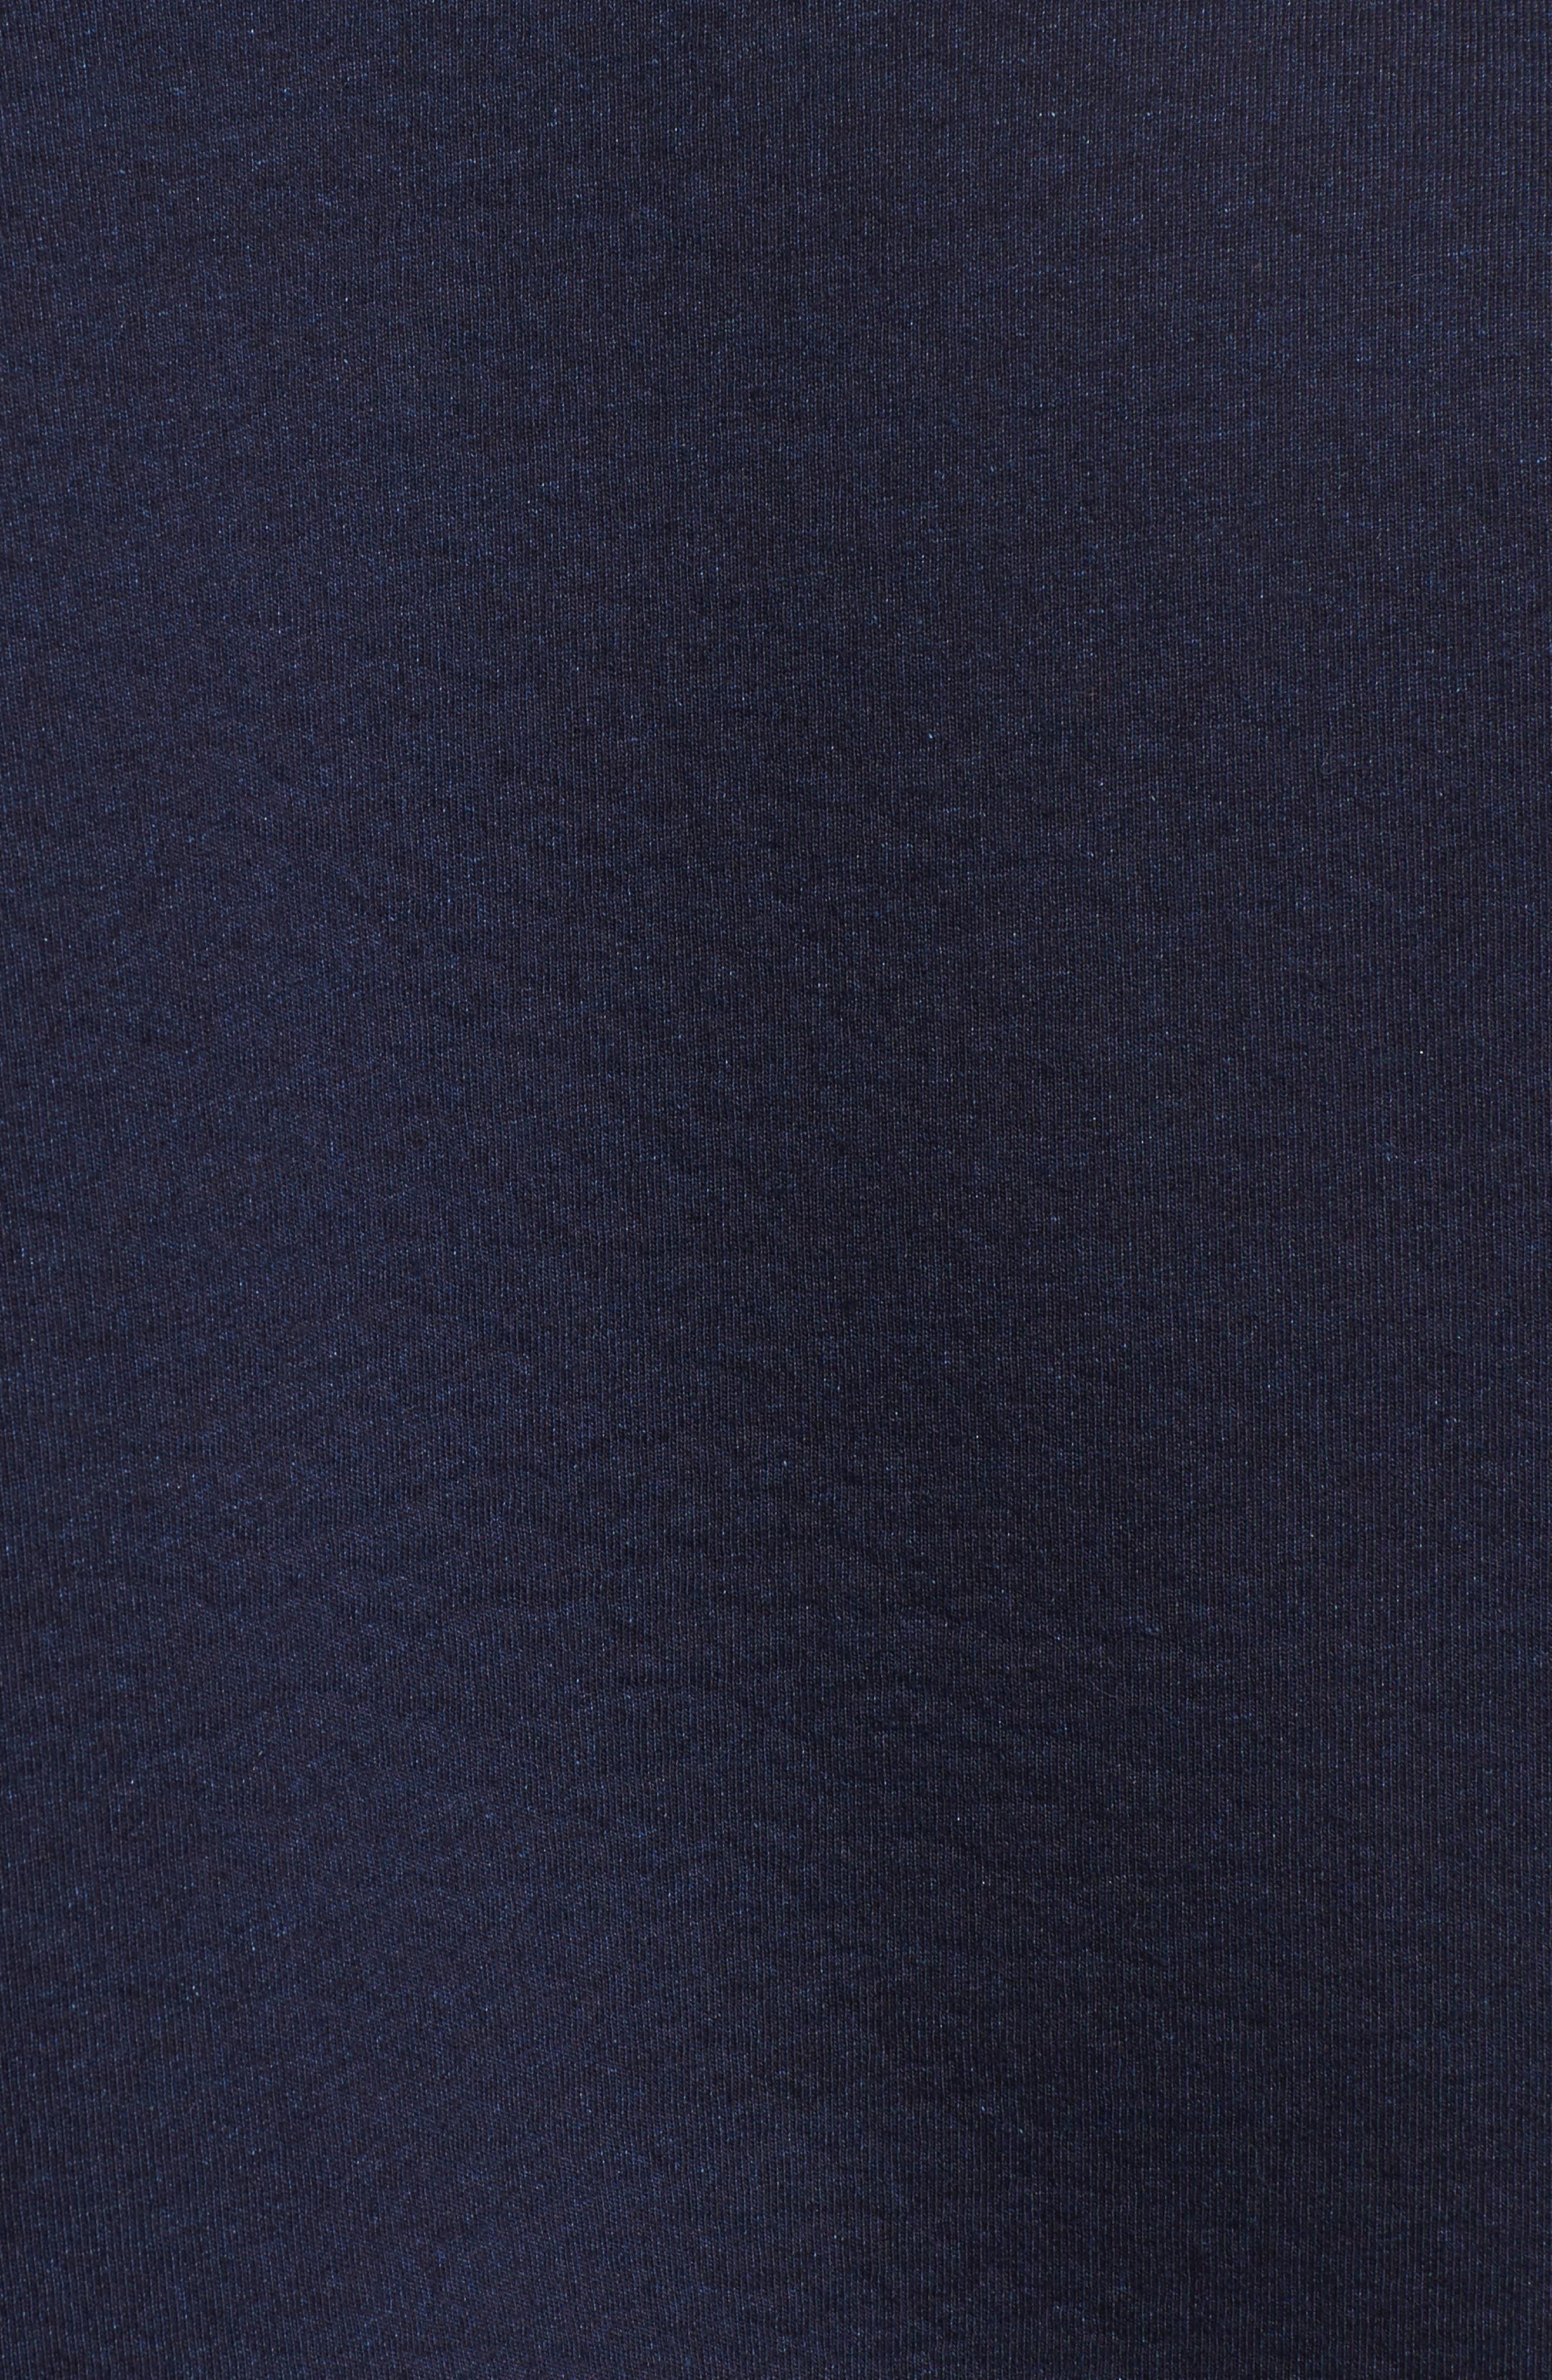 Neoprene Sweatshirt,                             Alternate thumbnail 5, color,                             400